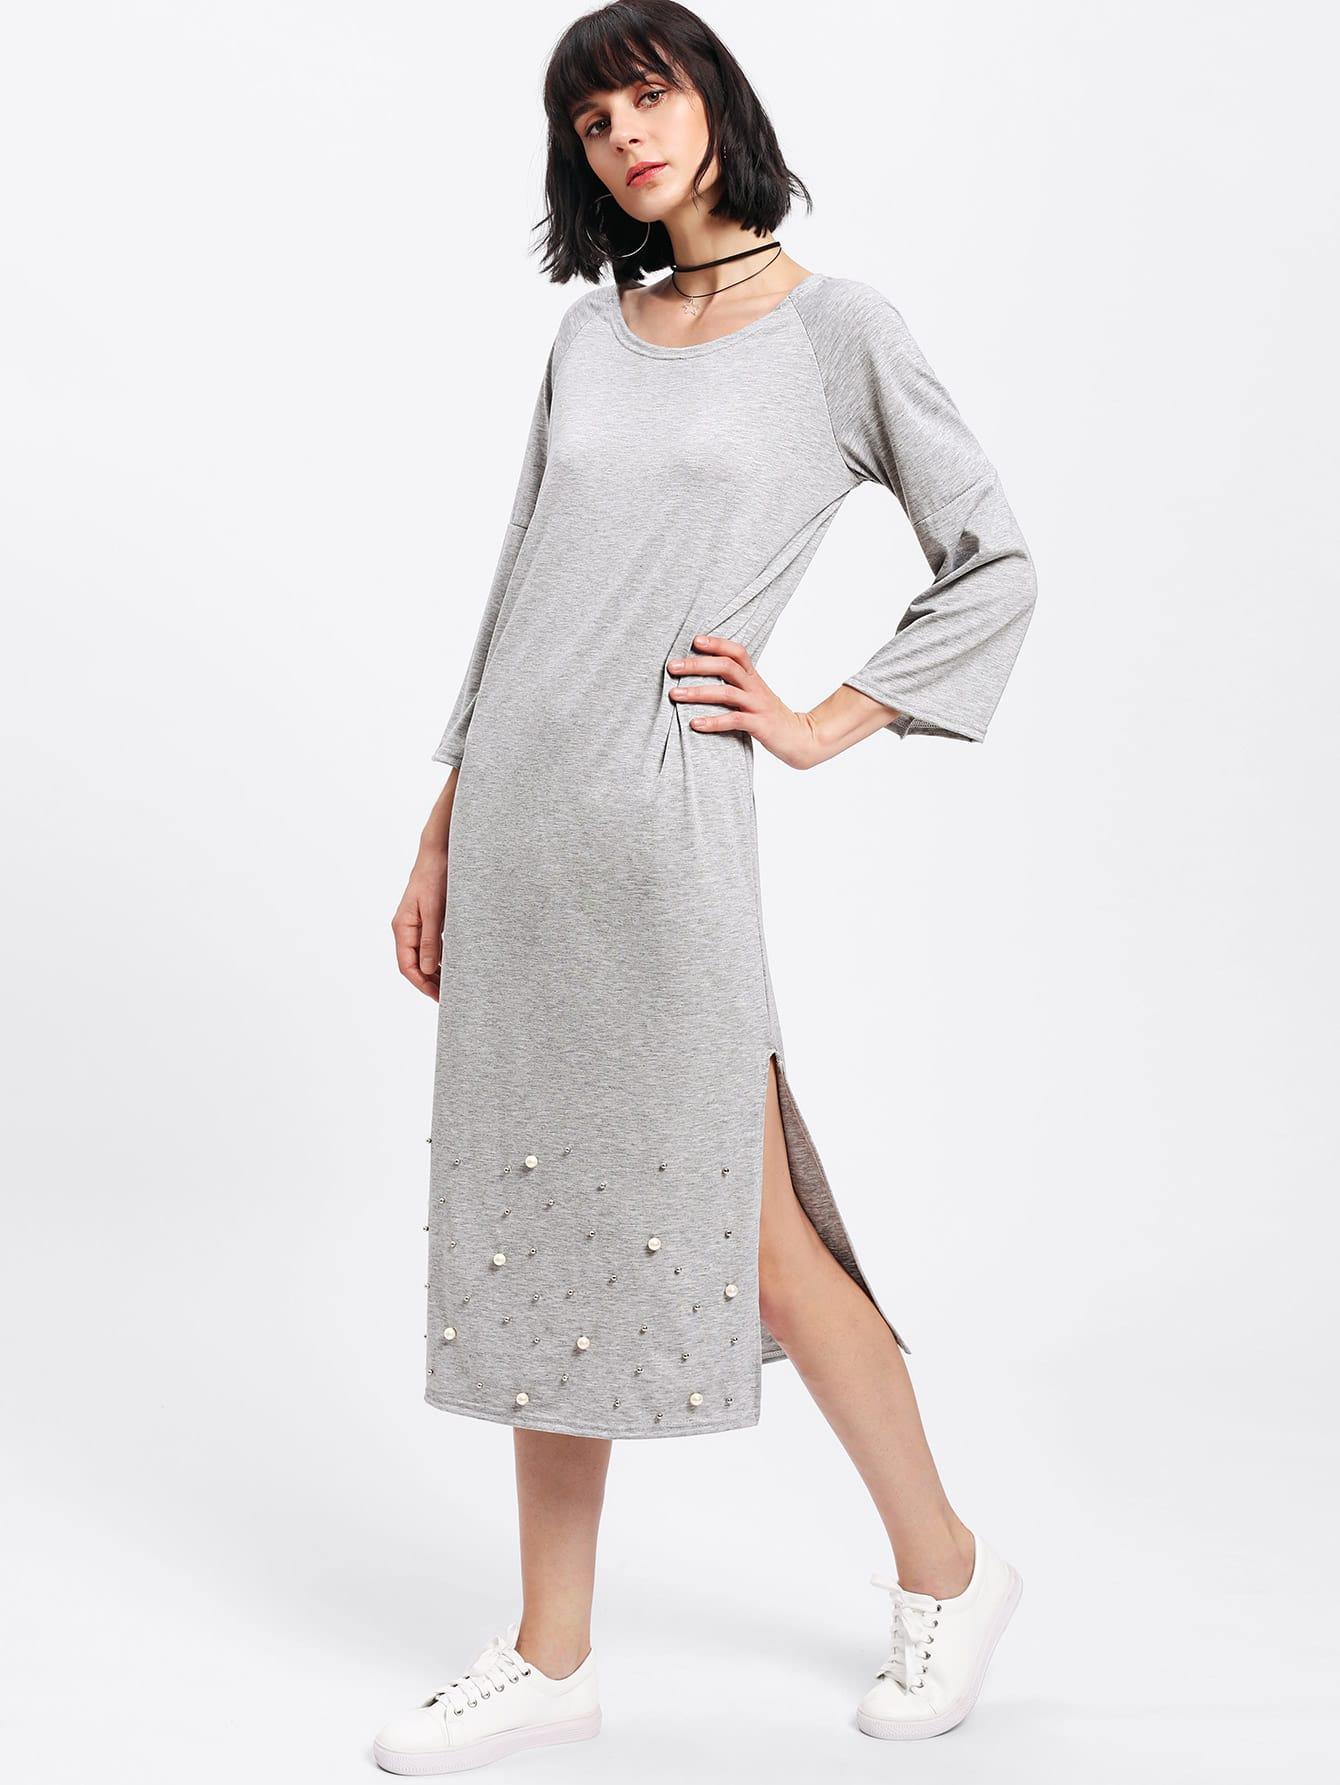 Beaded Detail Split Side Dress dress171110132